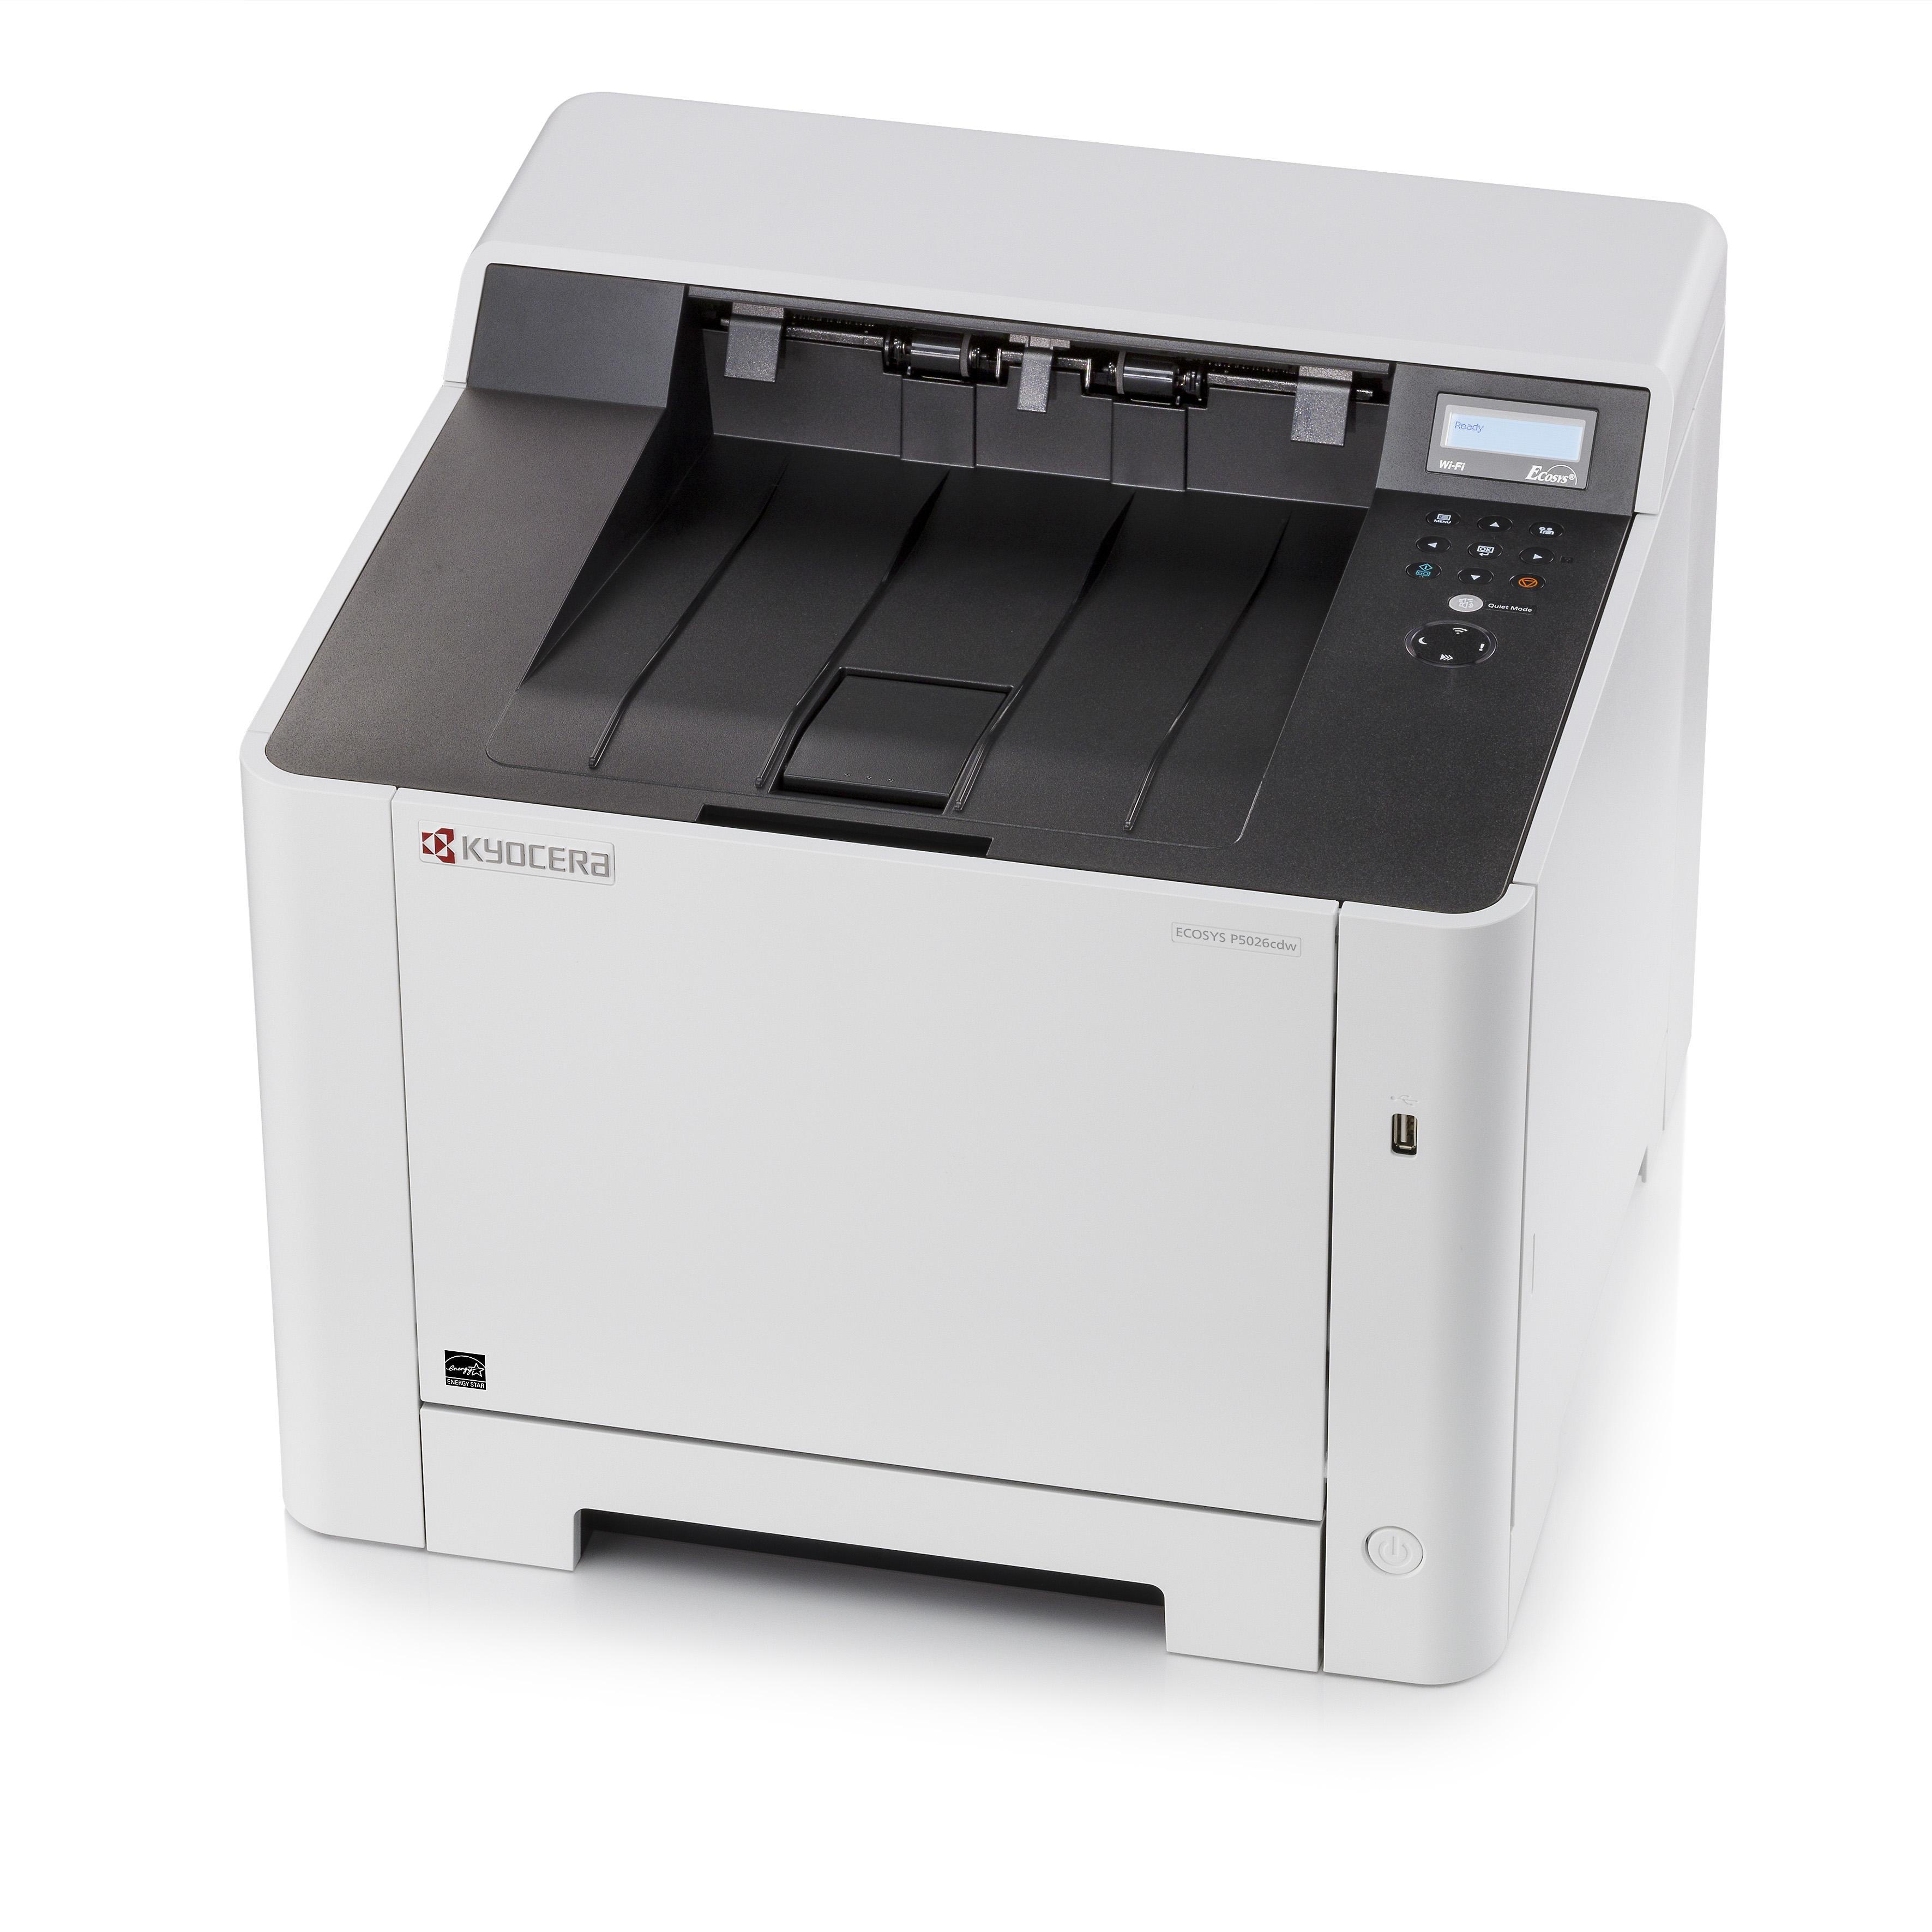 Kyocera Ecosys P5026CDW Color Printer